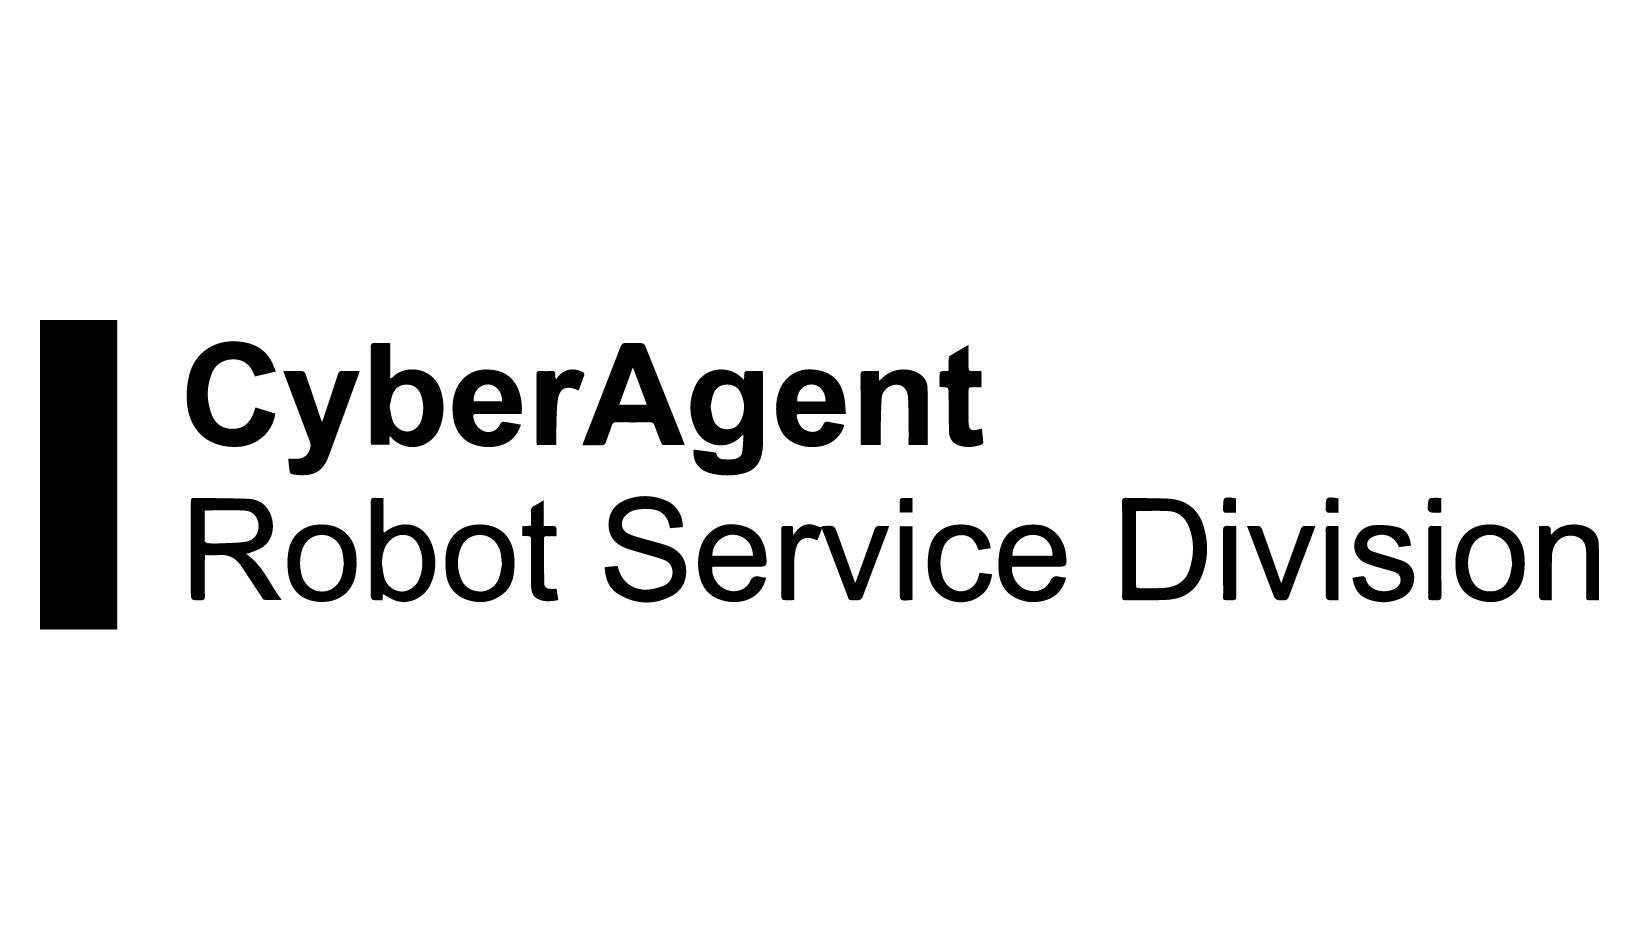 CyberAgent Robot Service Division